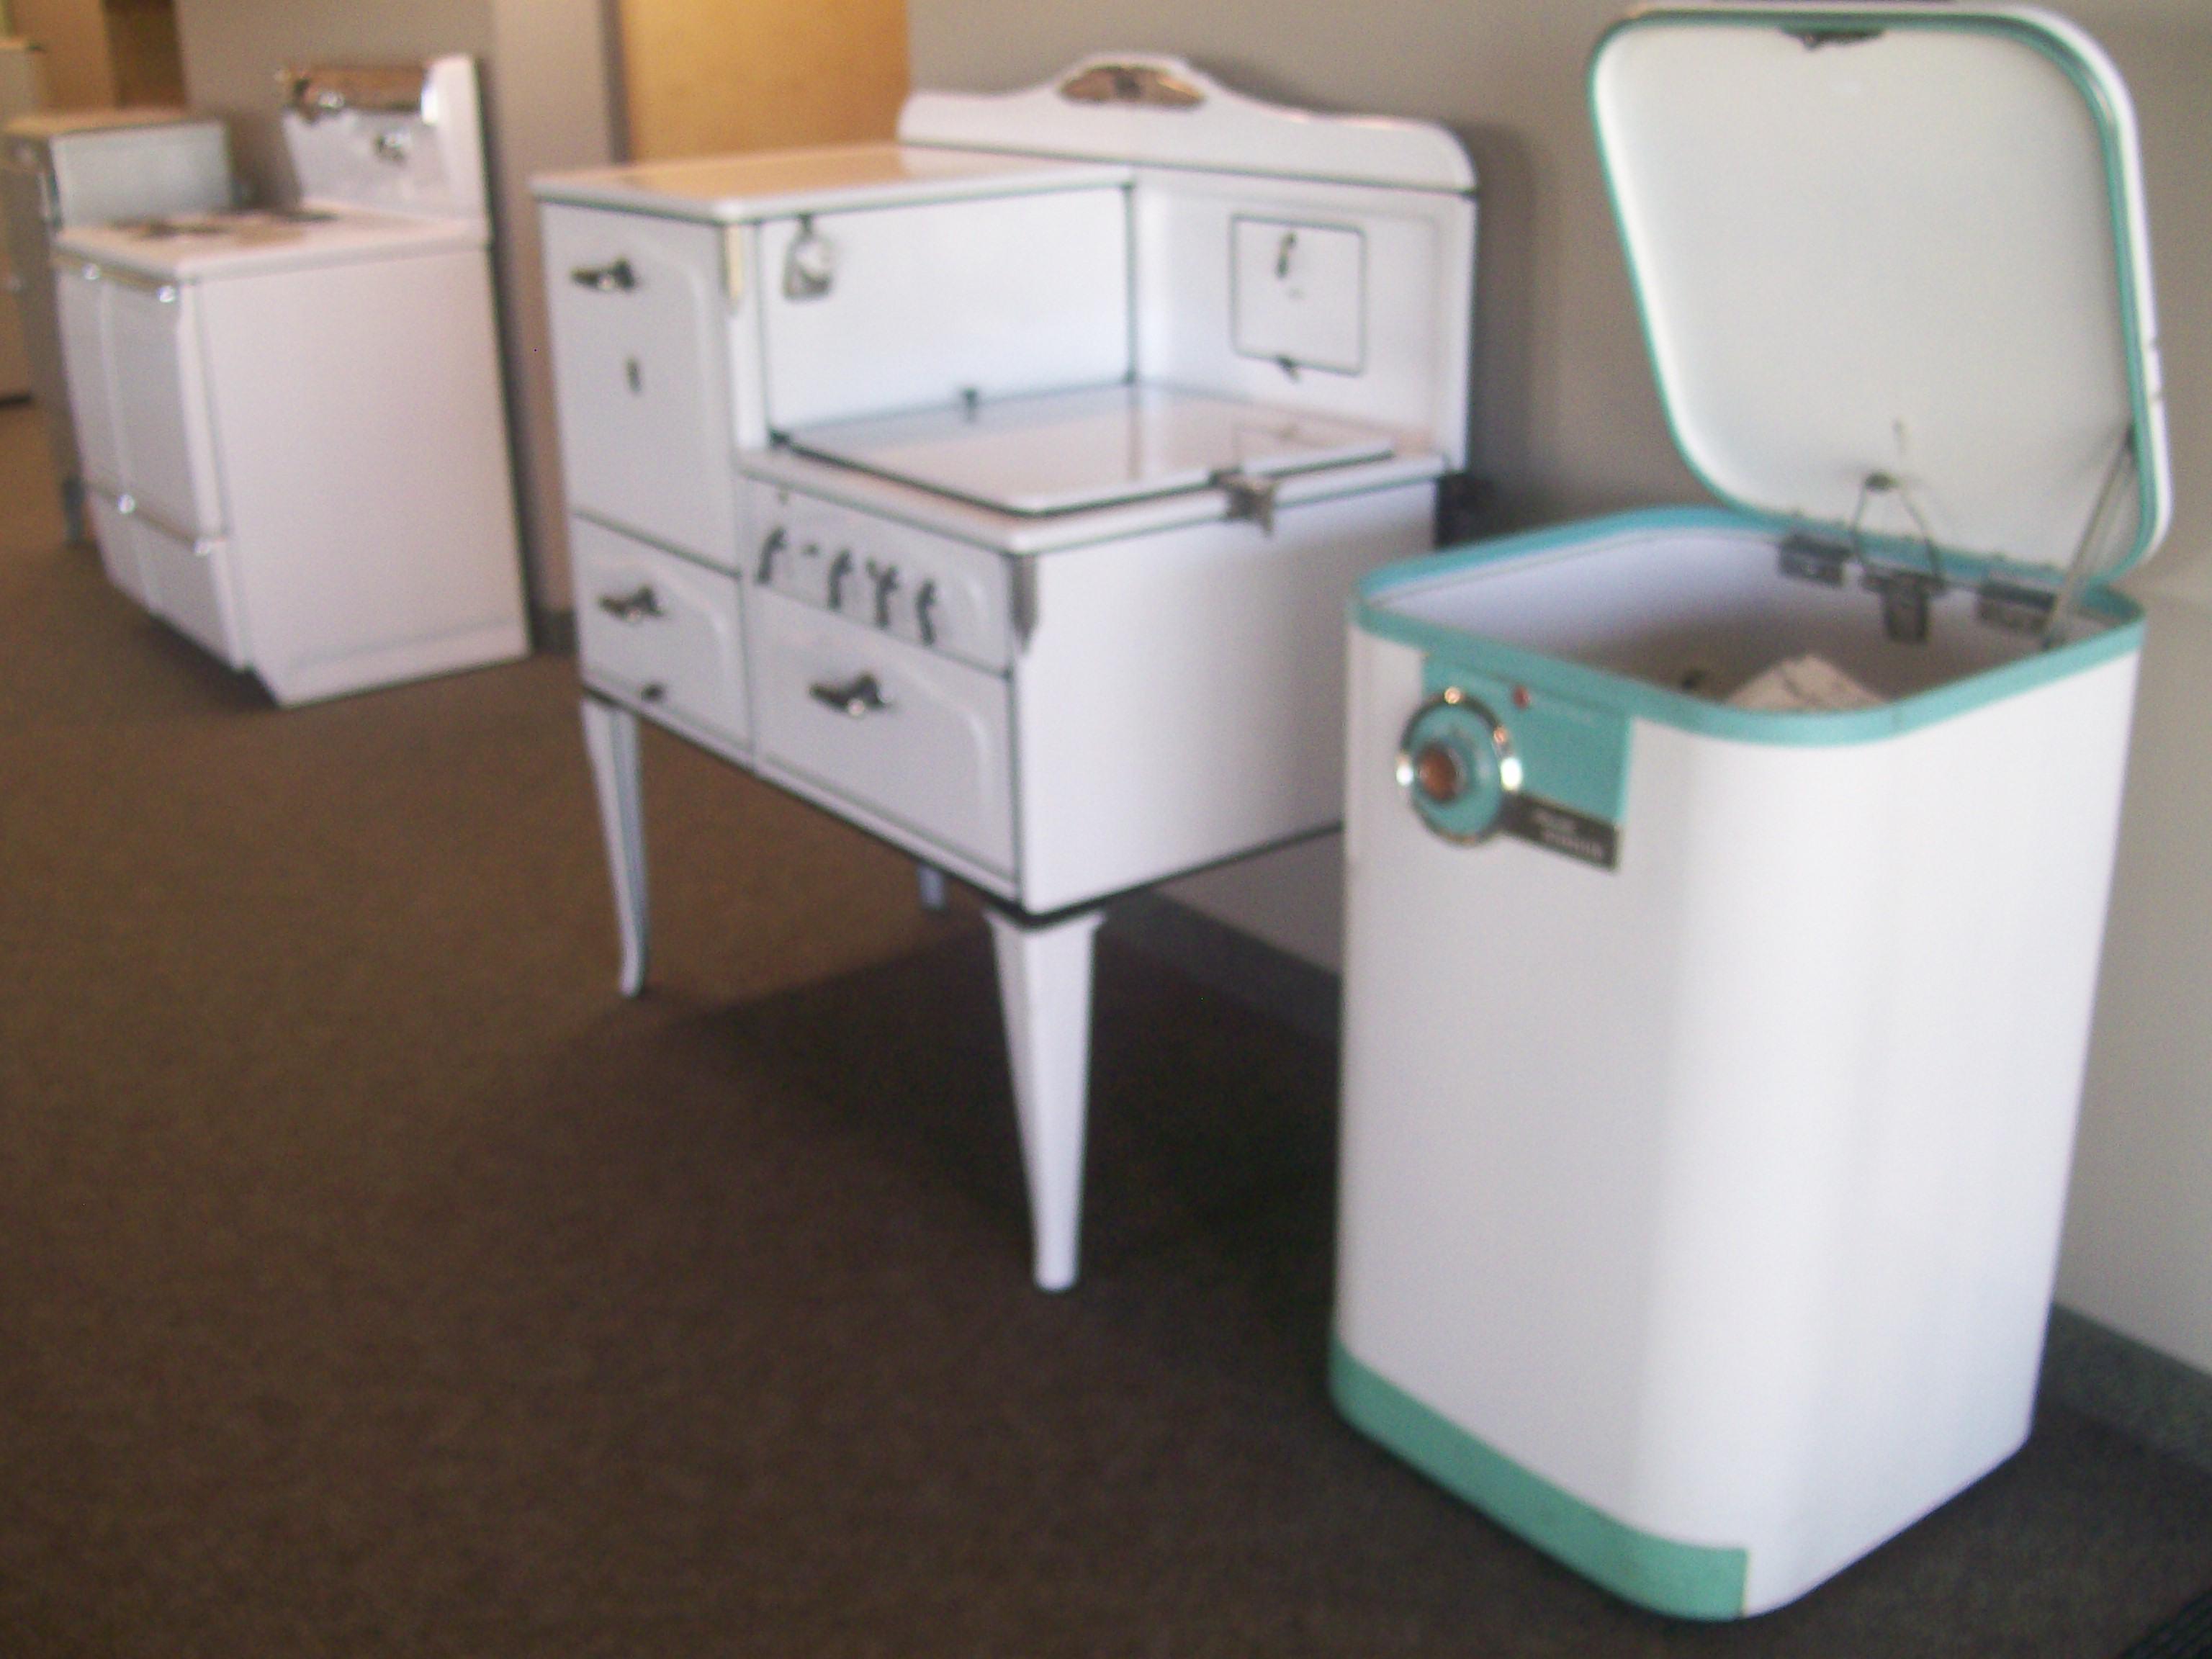 Uncategorized Retro Kitchen Appliance Packages appliance vintage appliances images of appliances